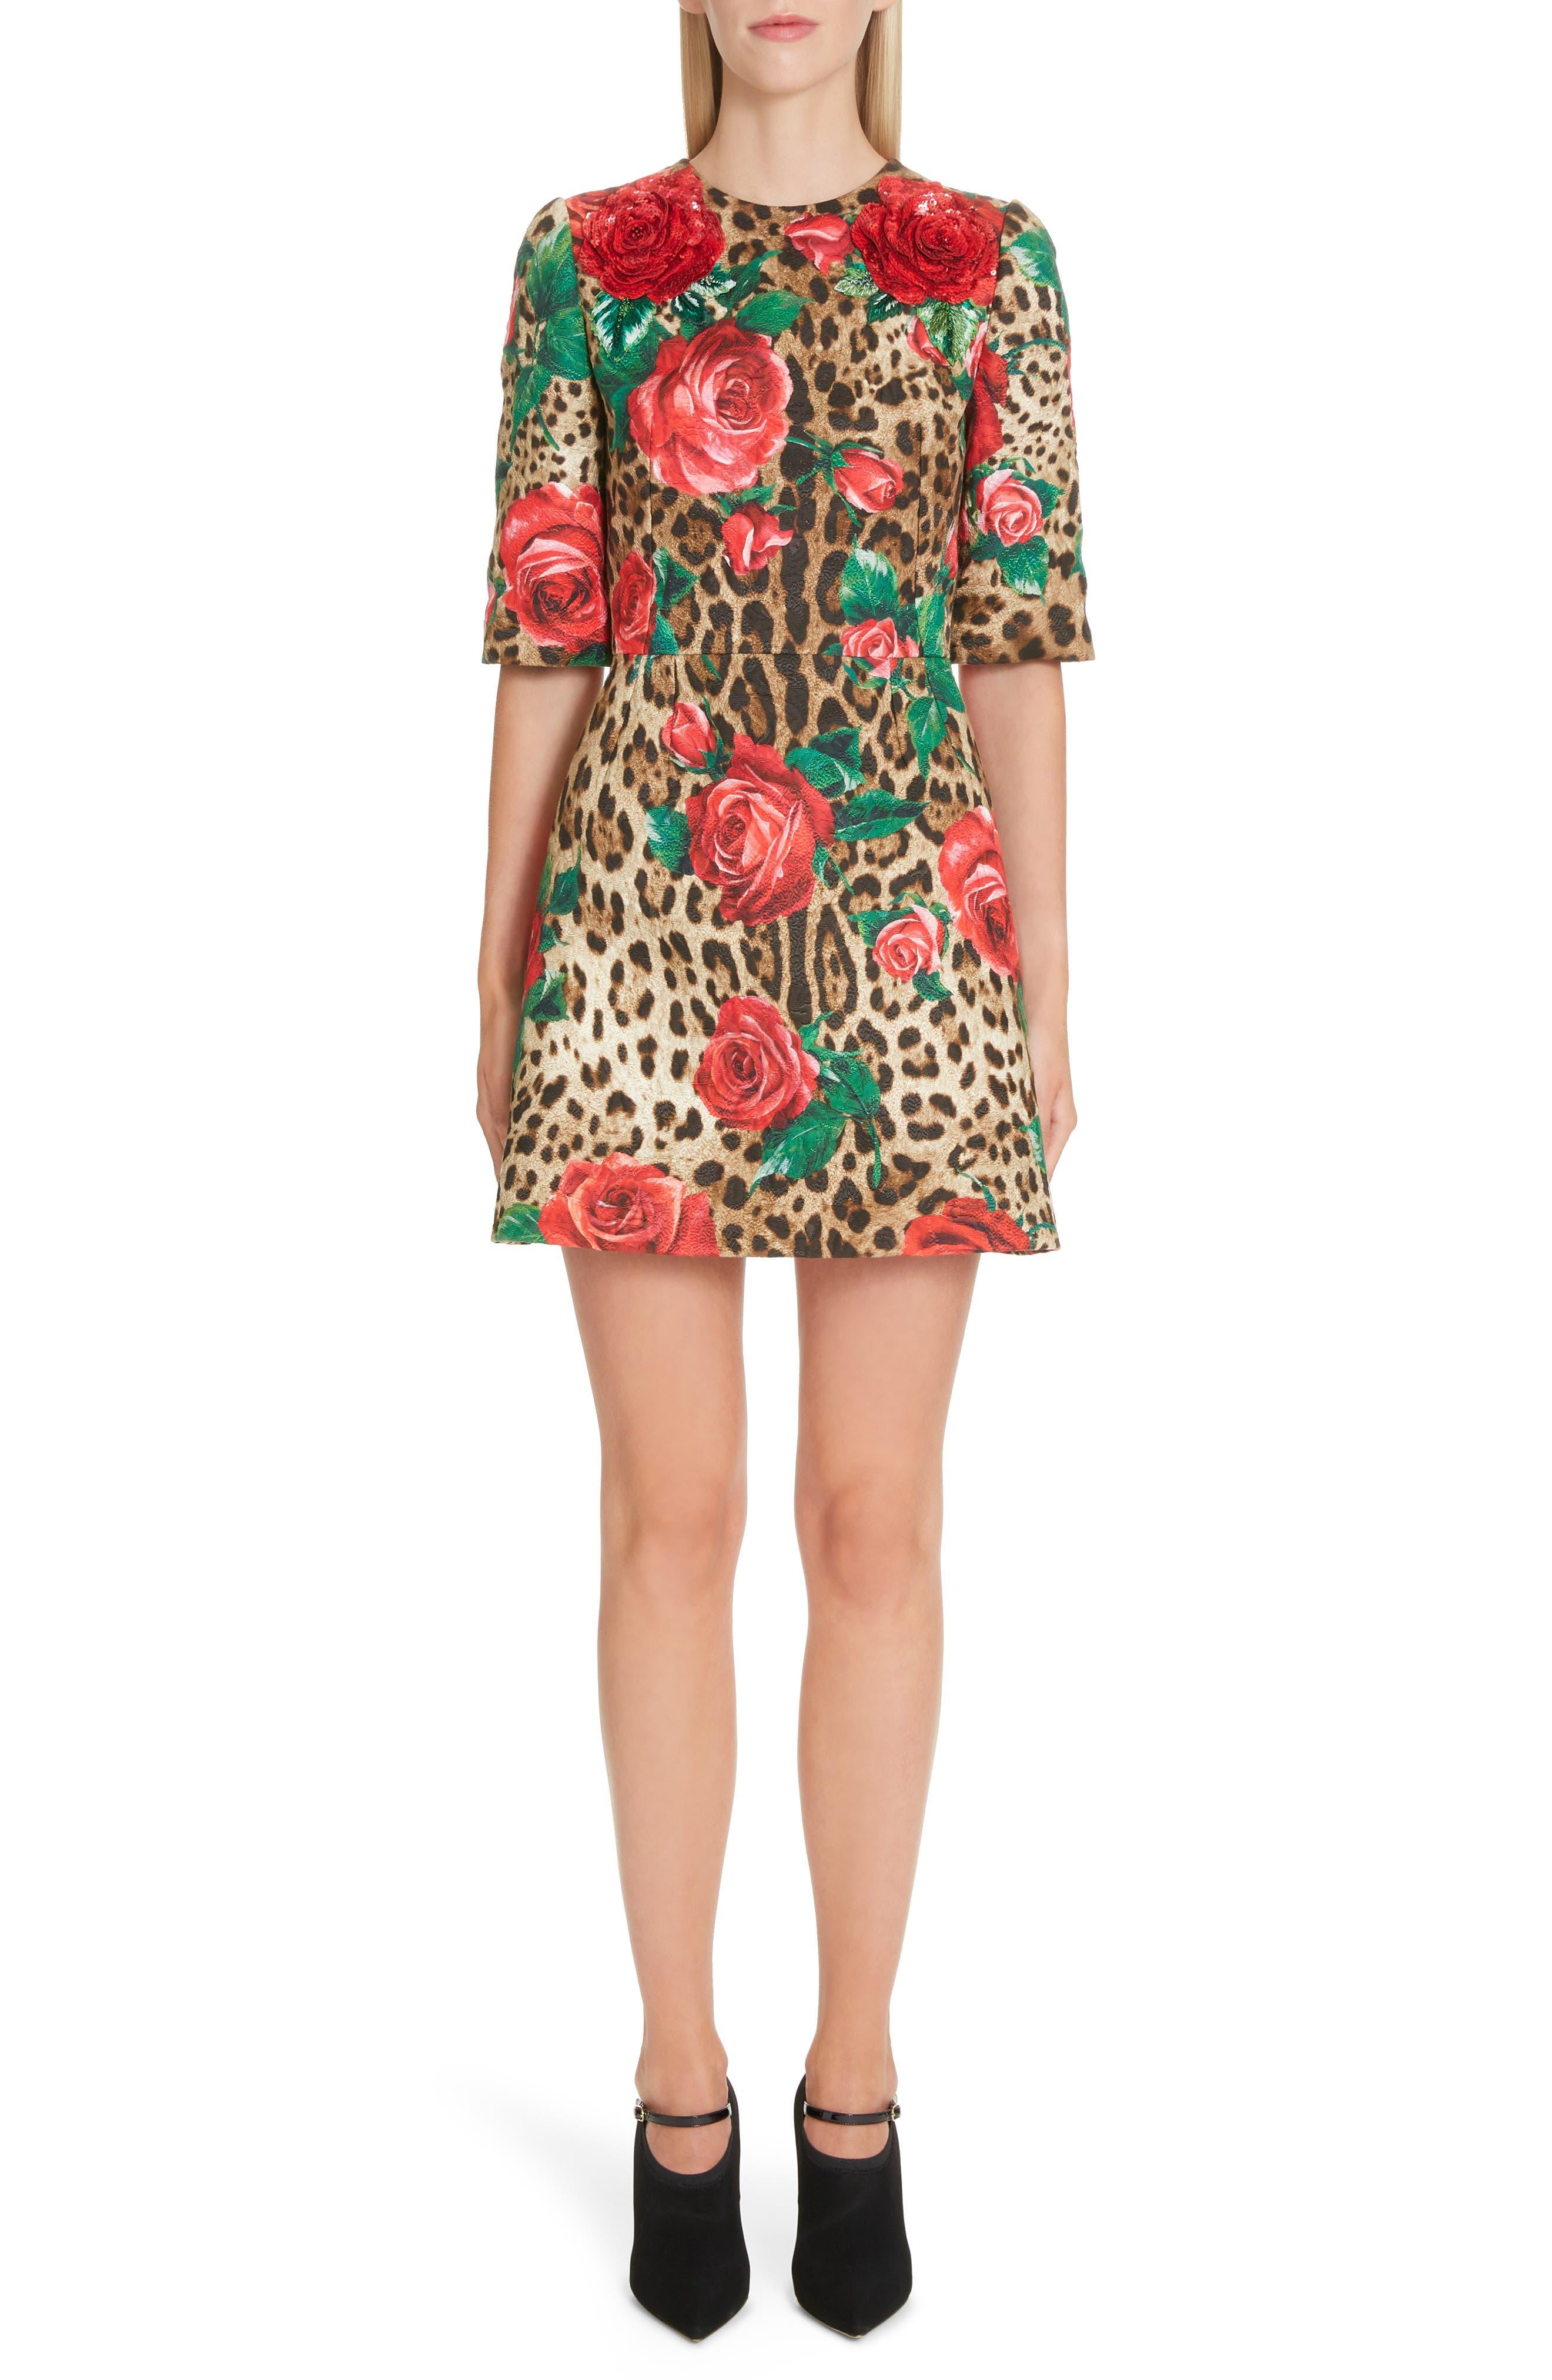 37c23d55 dolce and gabbana dresses | Nordstrom